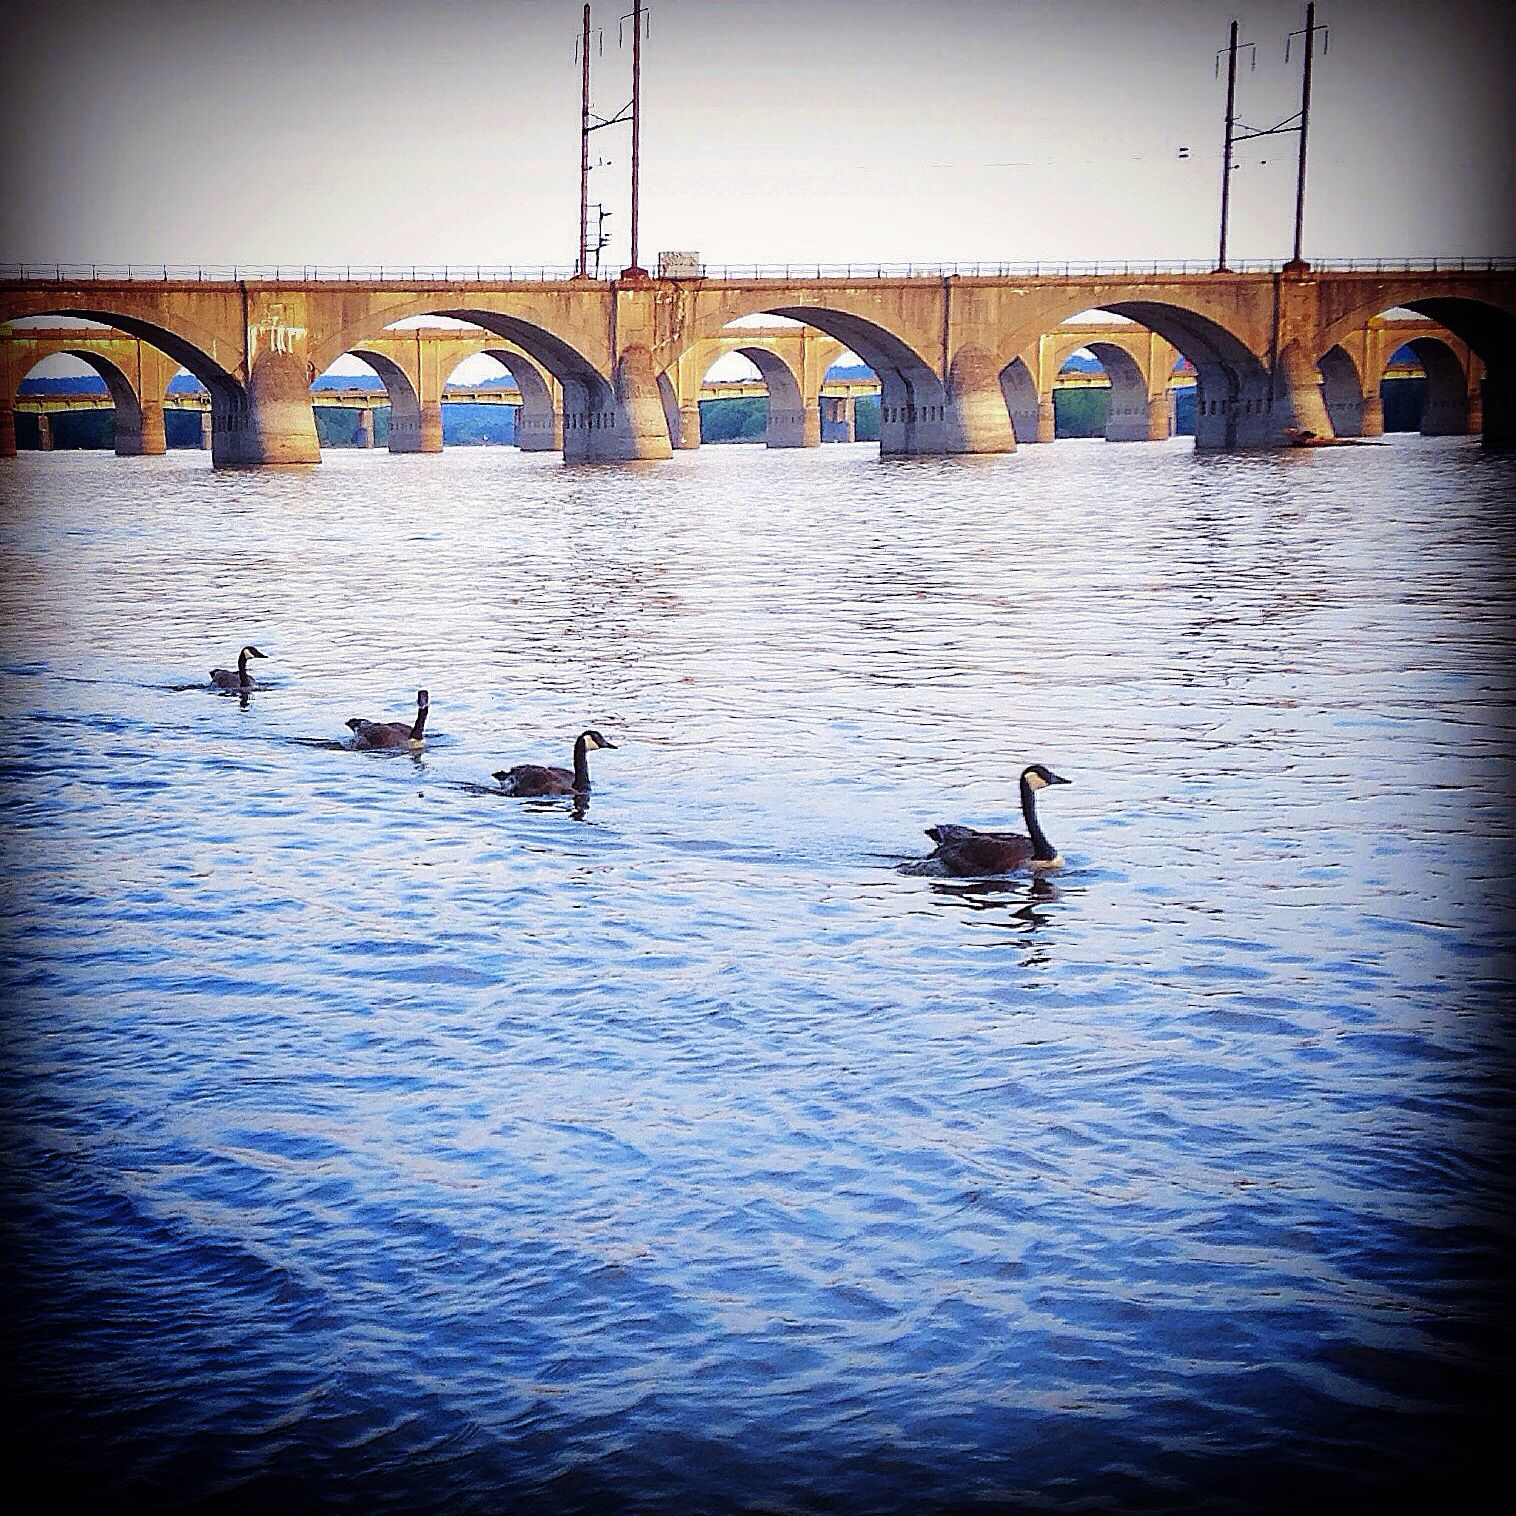 Ducks in a row harrisburg pennsylvania